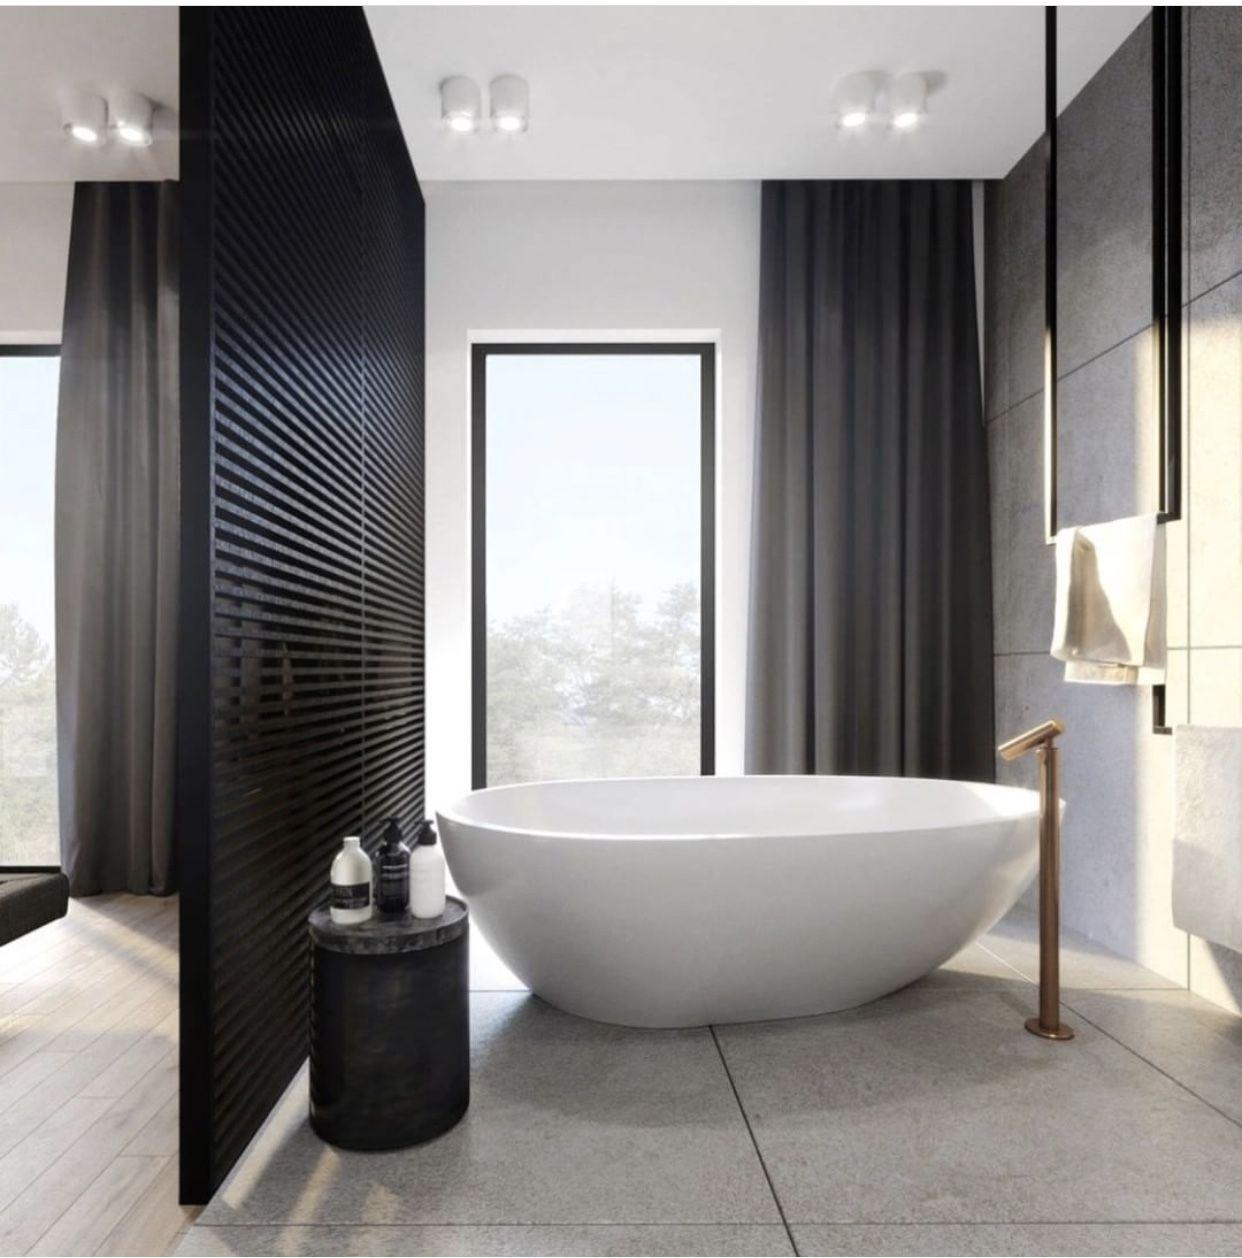 Cocoon Ensuite Bathroom Design Inspiration Modern High End Stainless Steel Bathro Large Bathroom Remodel Inexpensive Bathroom Remodel Cheap Bathroom Remodel